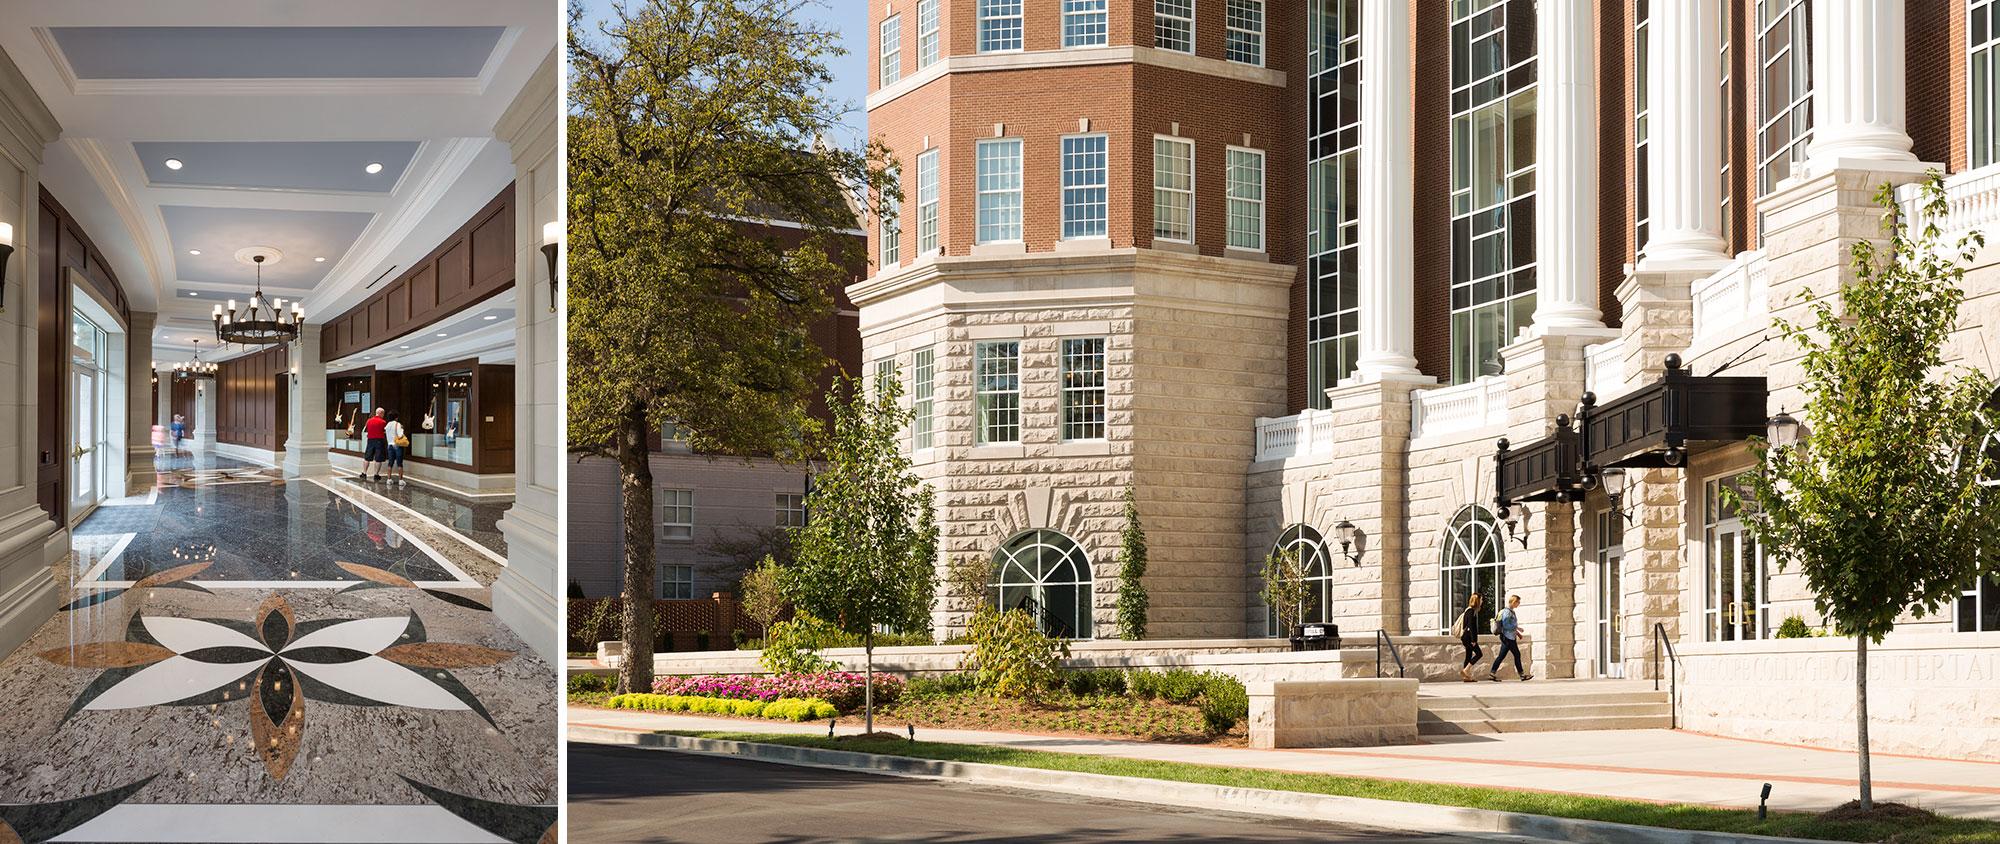 Belmont University R. Milton and Denice Johnson Center